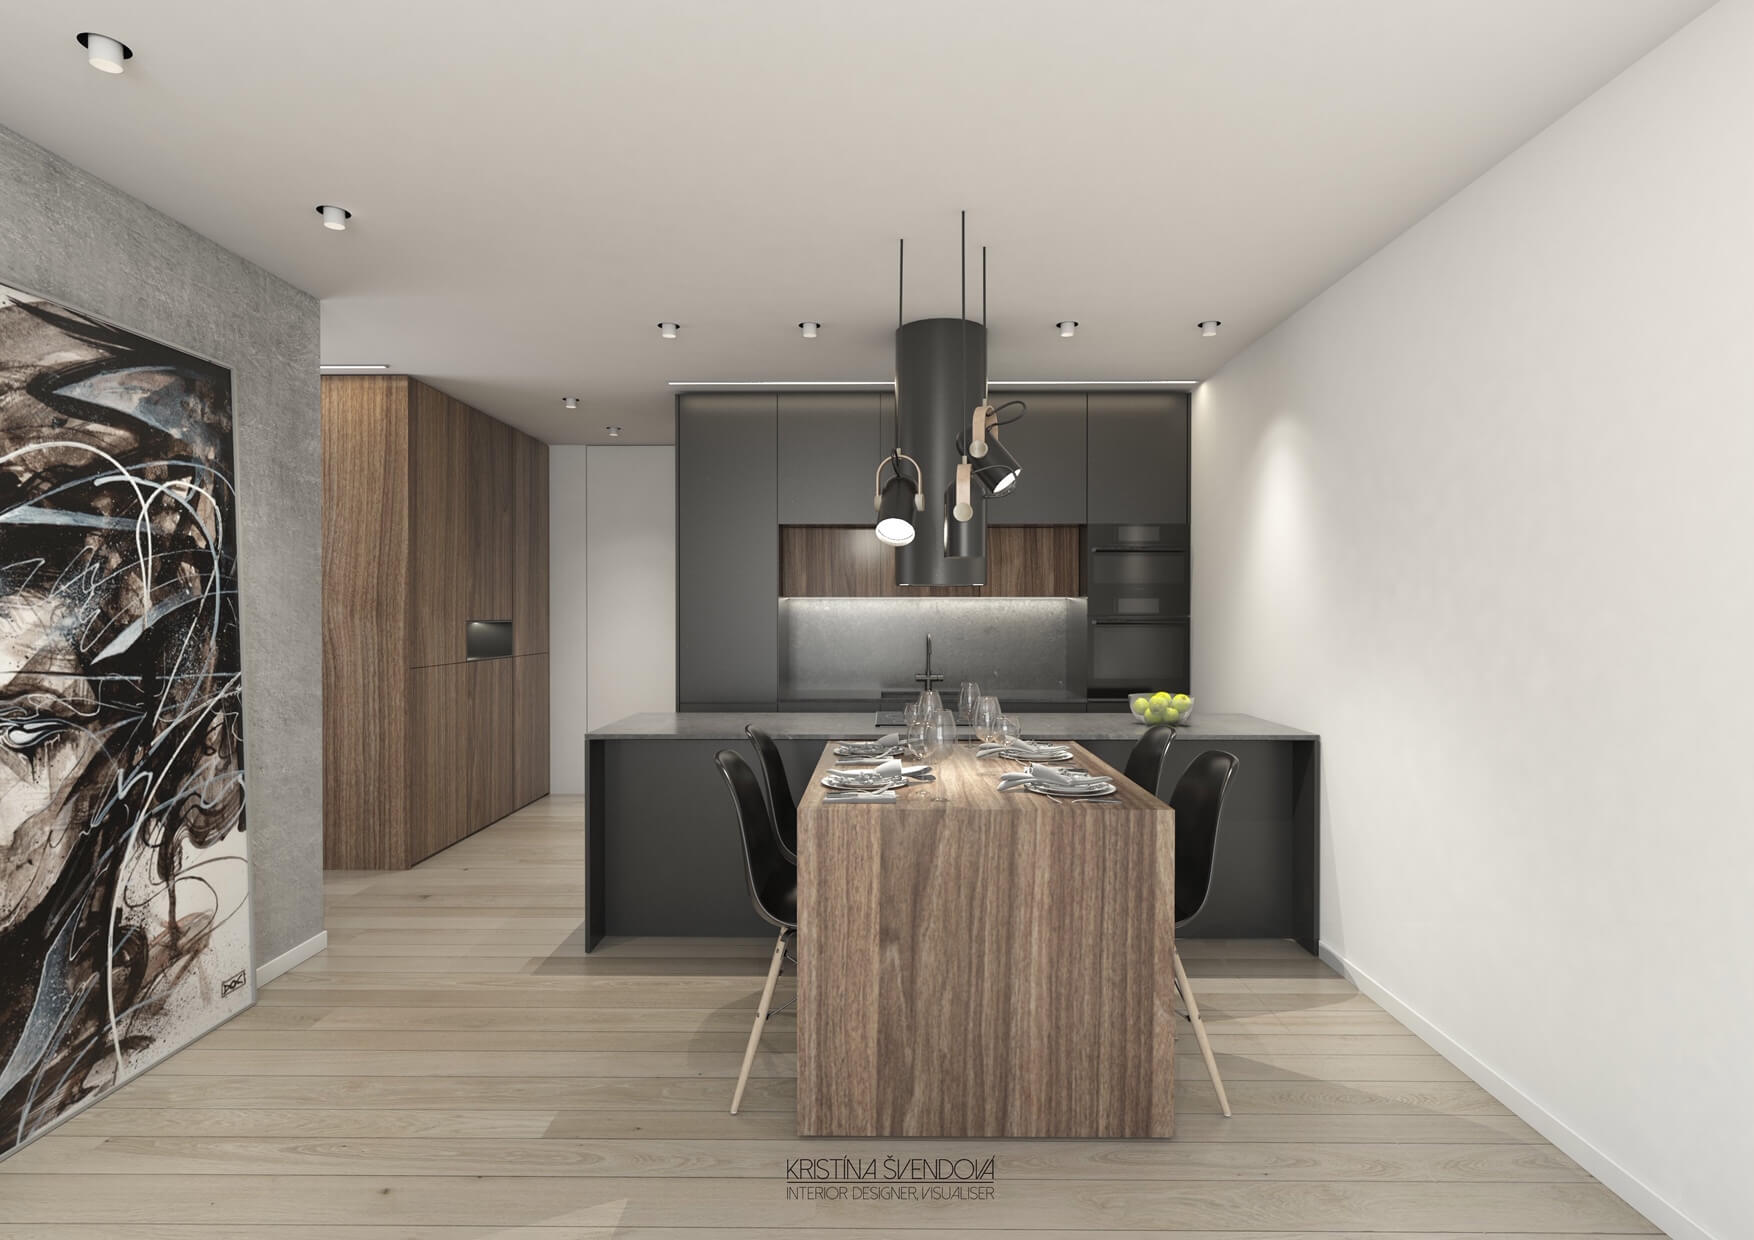 Predané: Exkluzívny 3- izbový byt v NOVOSTAVBE BA-NIVY, City Park, 71,24m2, balkón 8,5m2-5